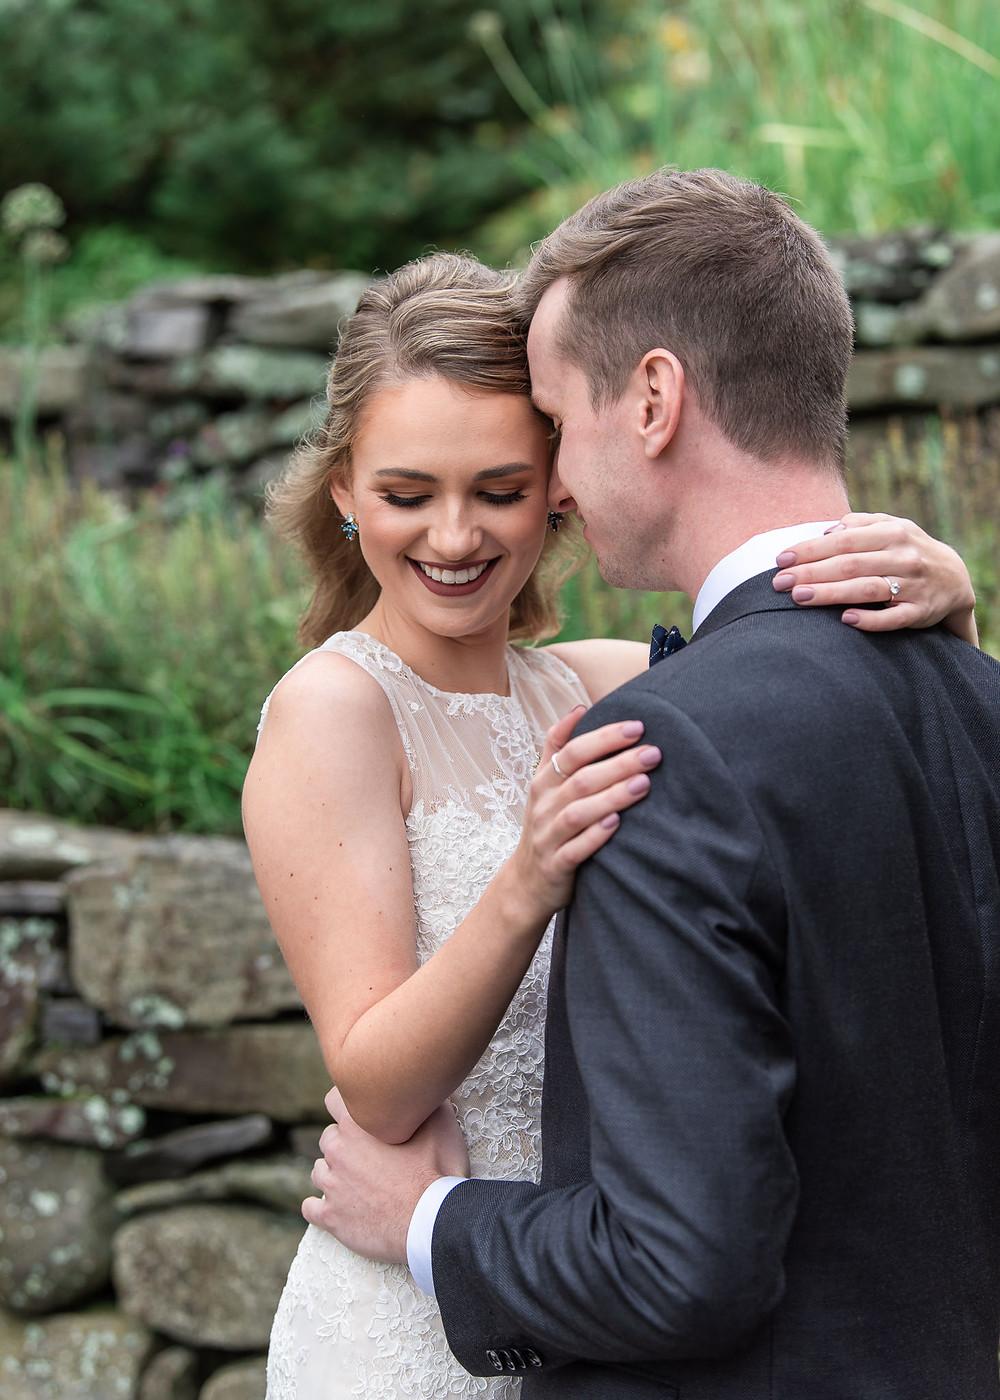 Beech Hill Barn Wedding in Maine - Maine wedding photographer